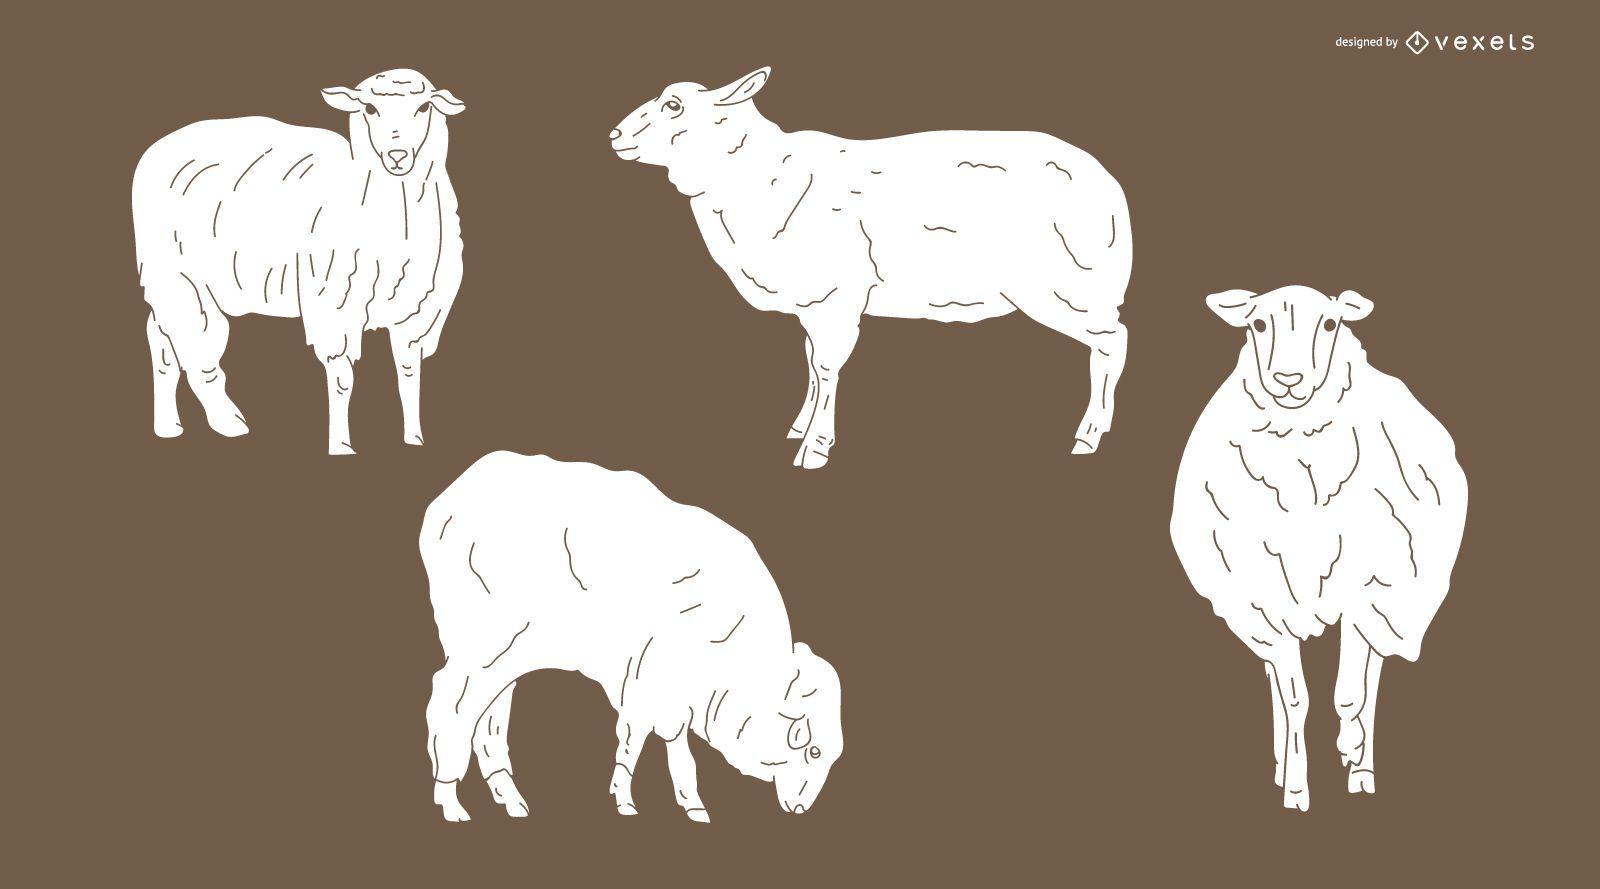 Diseño de silueta detallada de ovejas